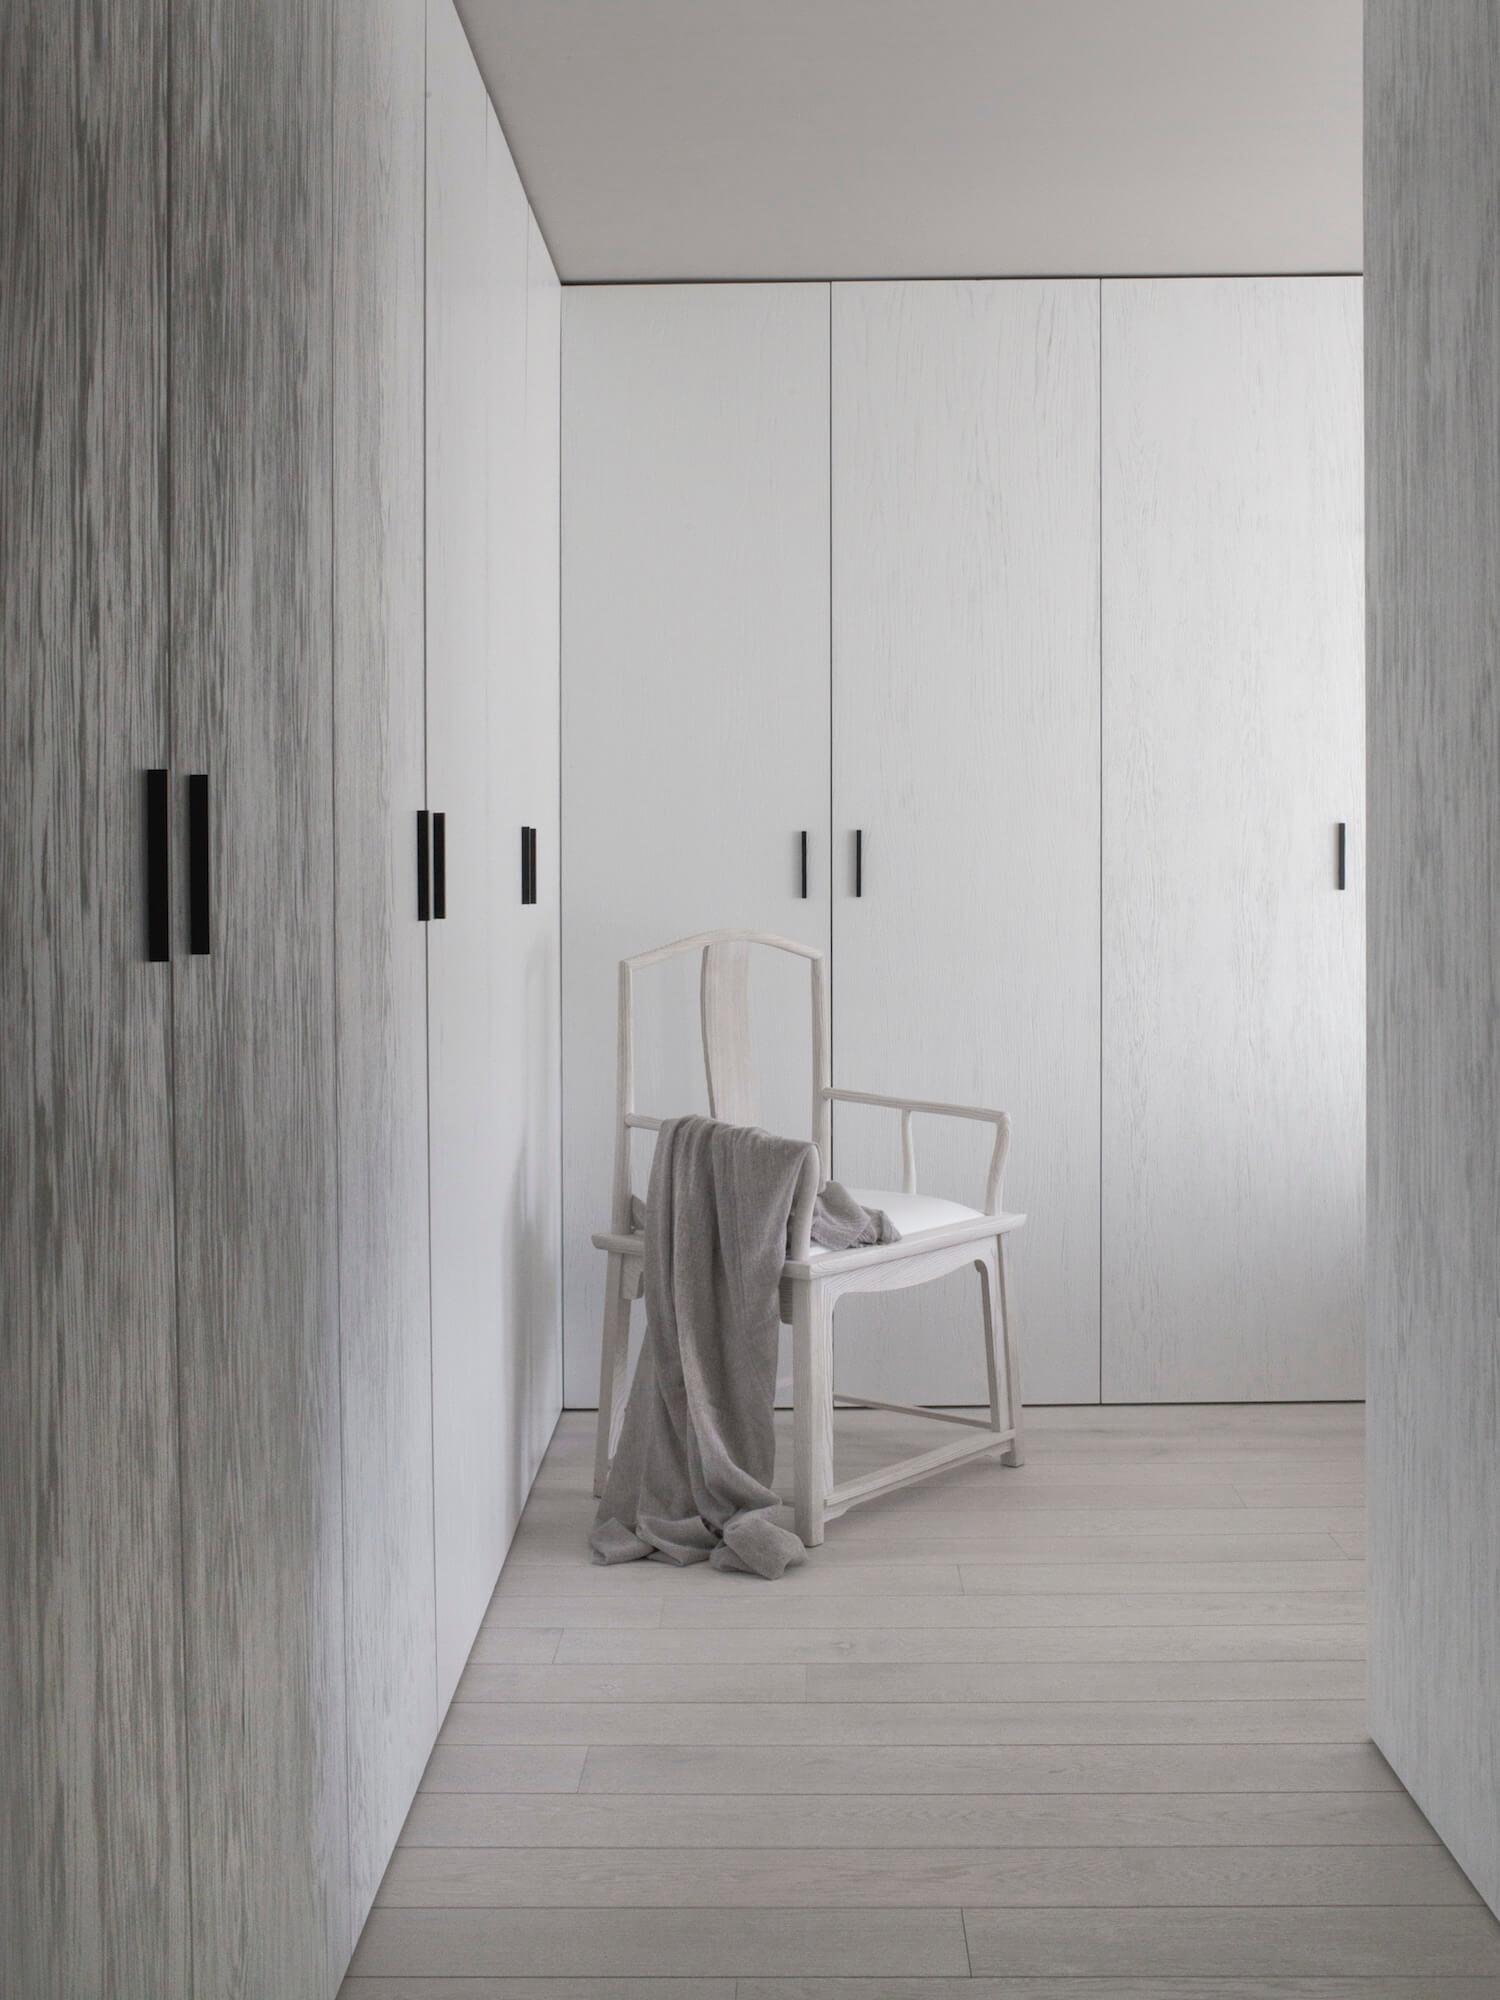 phong cách tối giản elledecoration vietnam-paris-apartment-guillaume-alan14